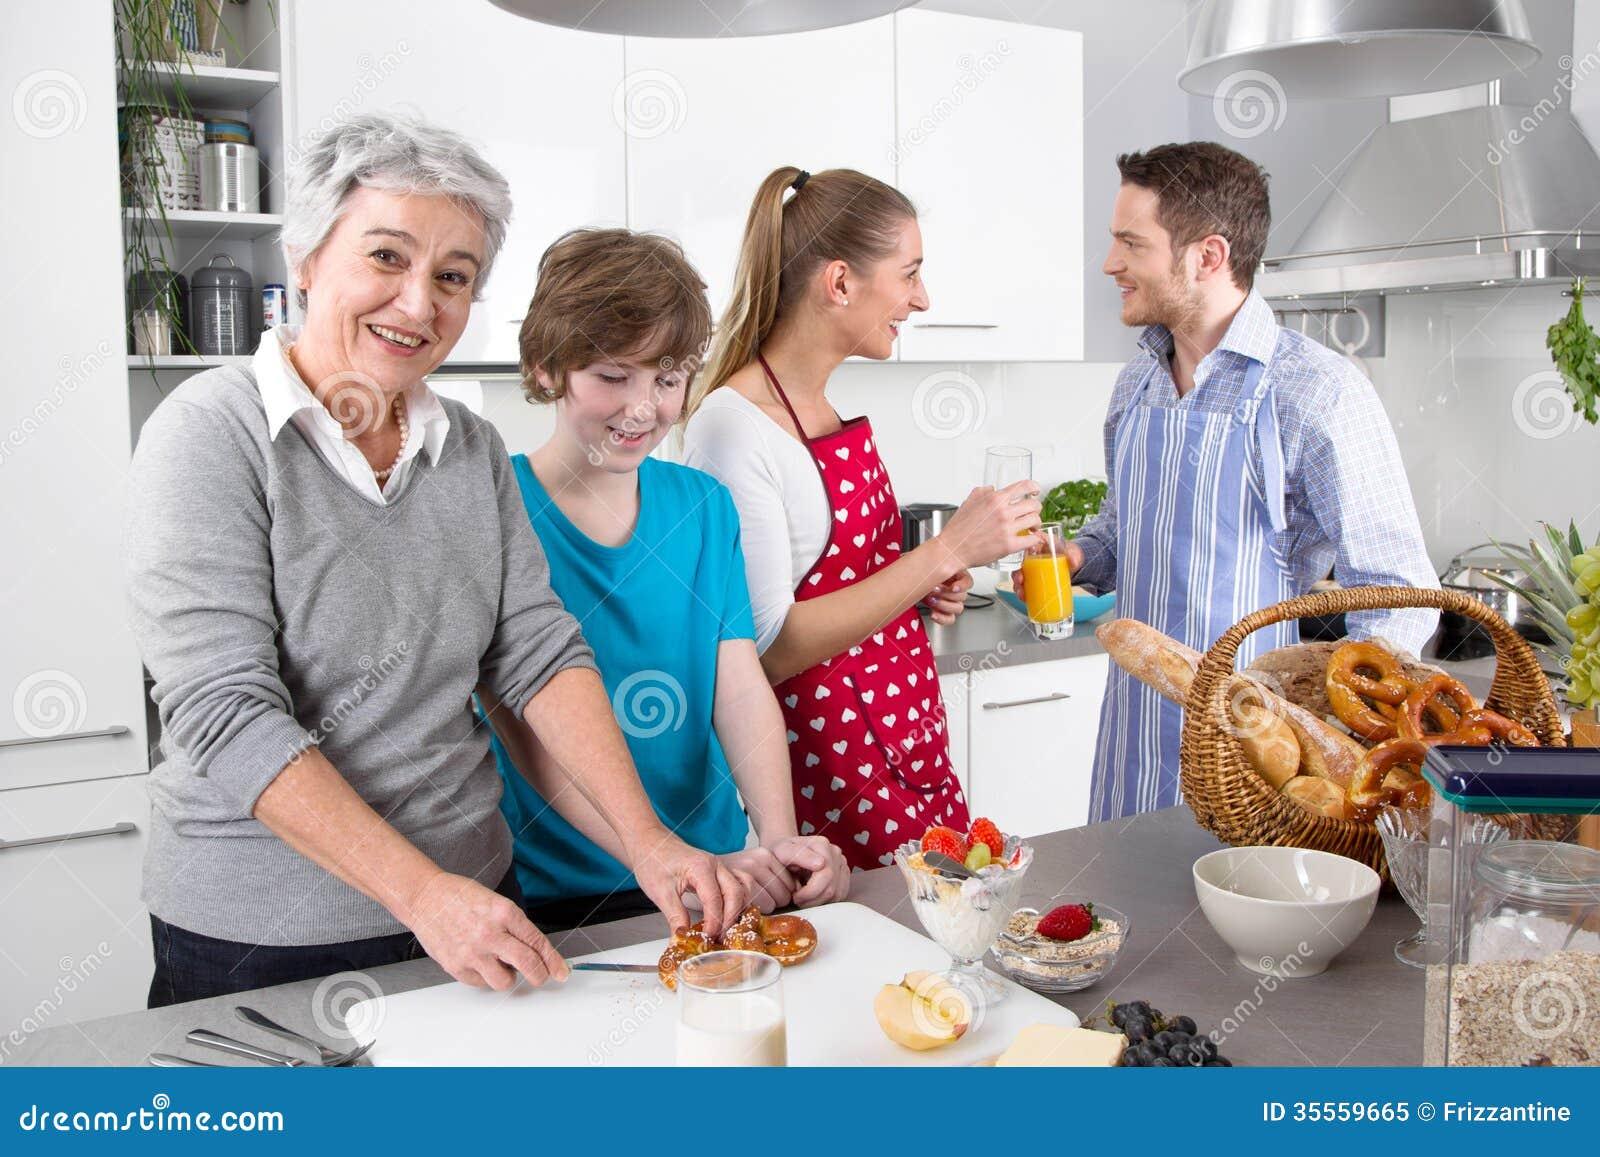 С бабушкой на кухне 11 фотография